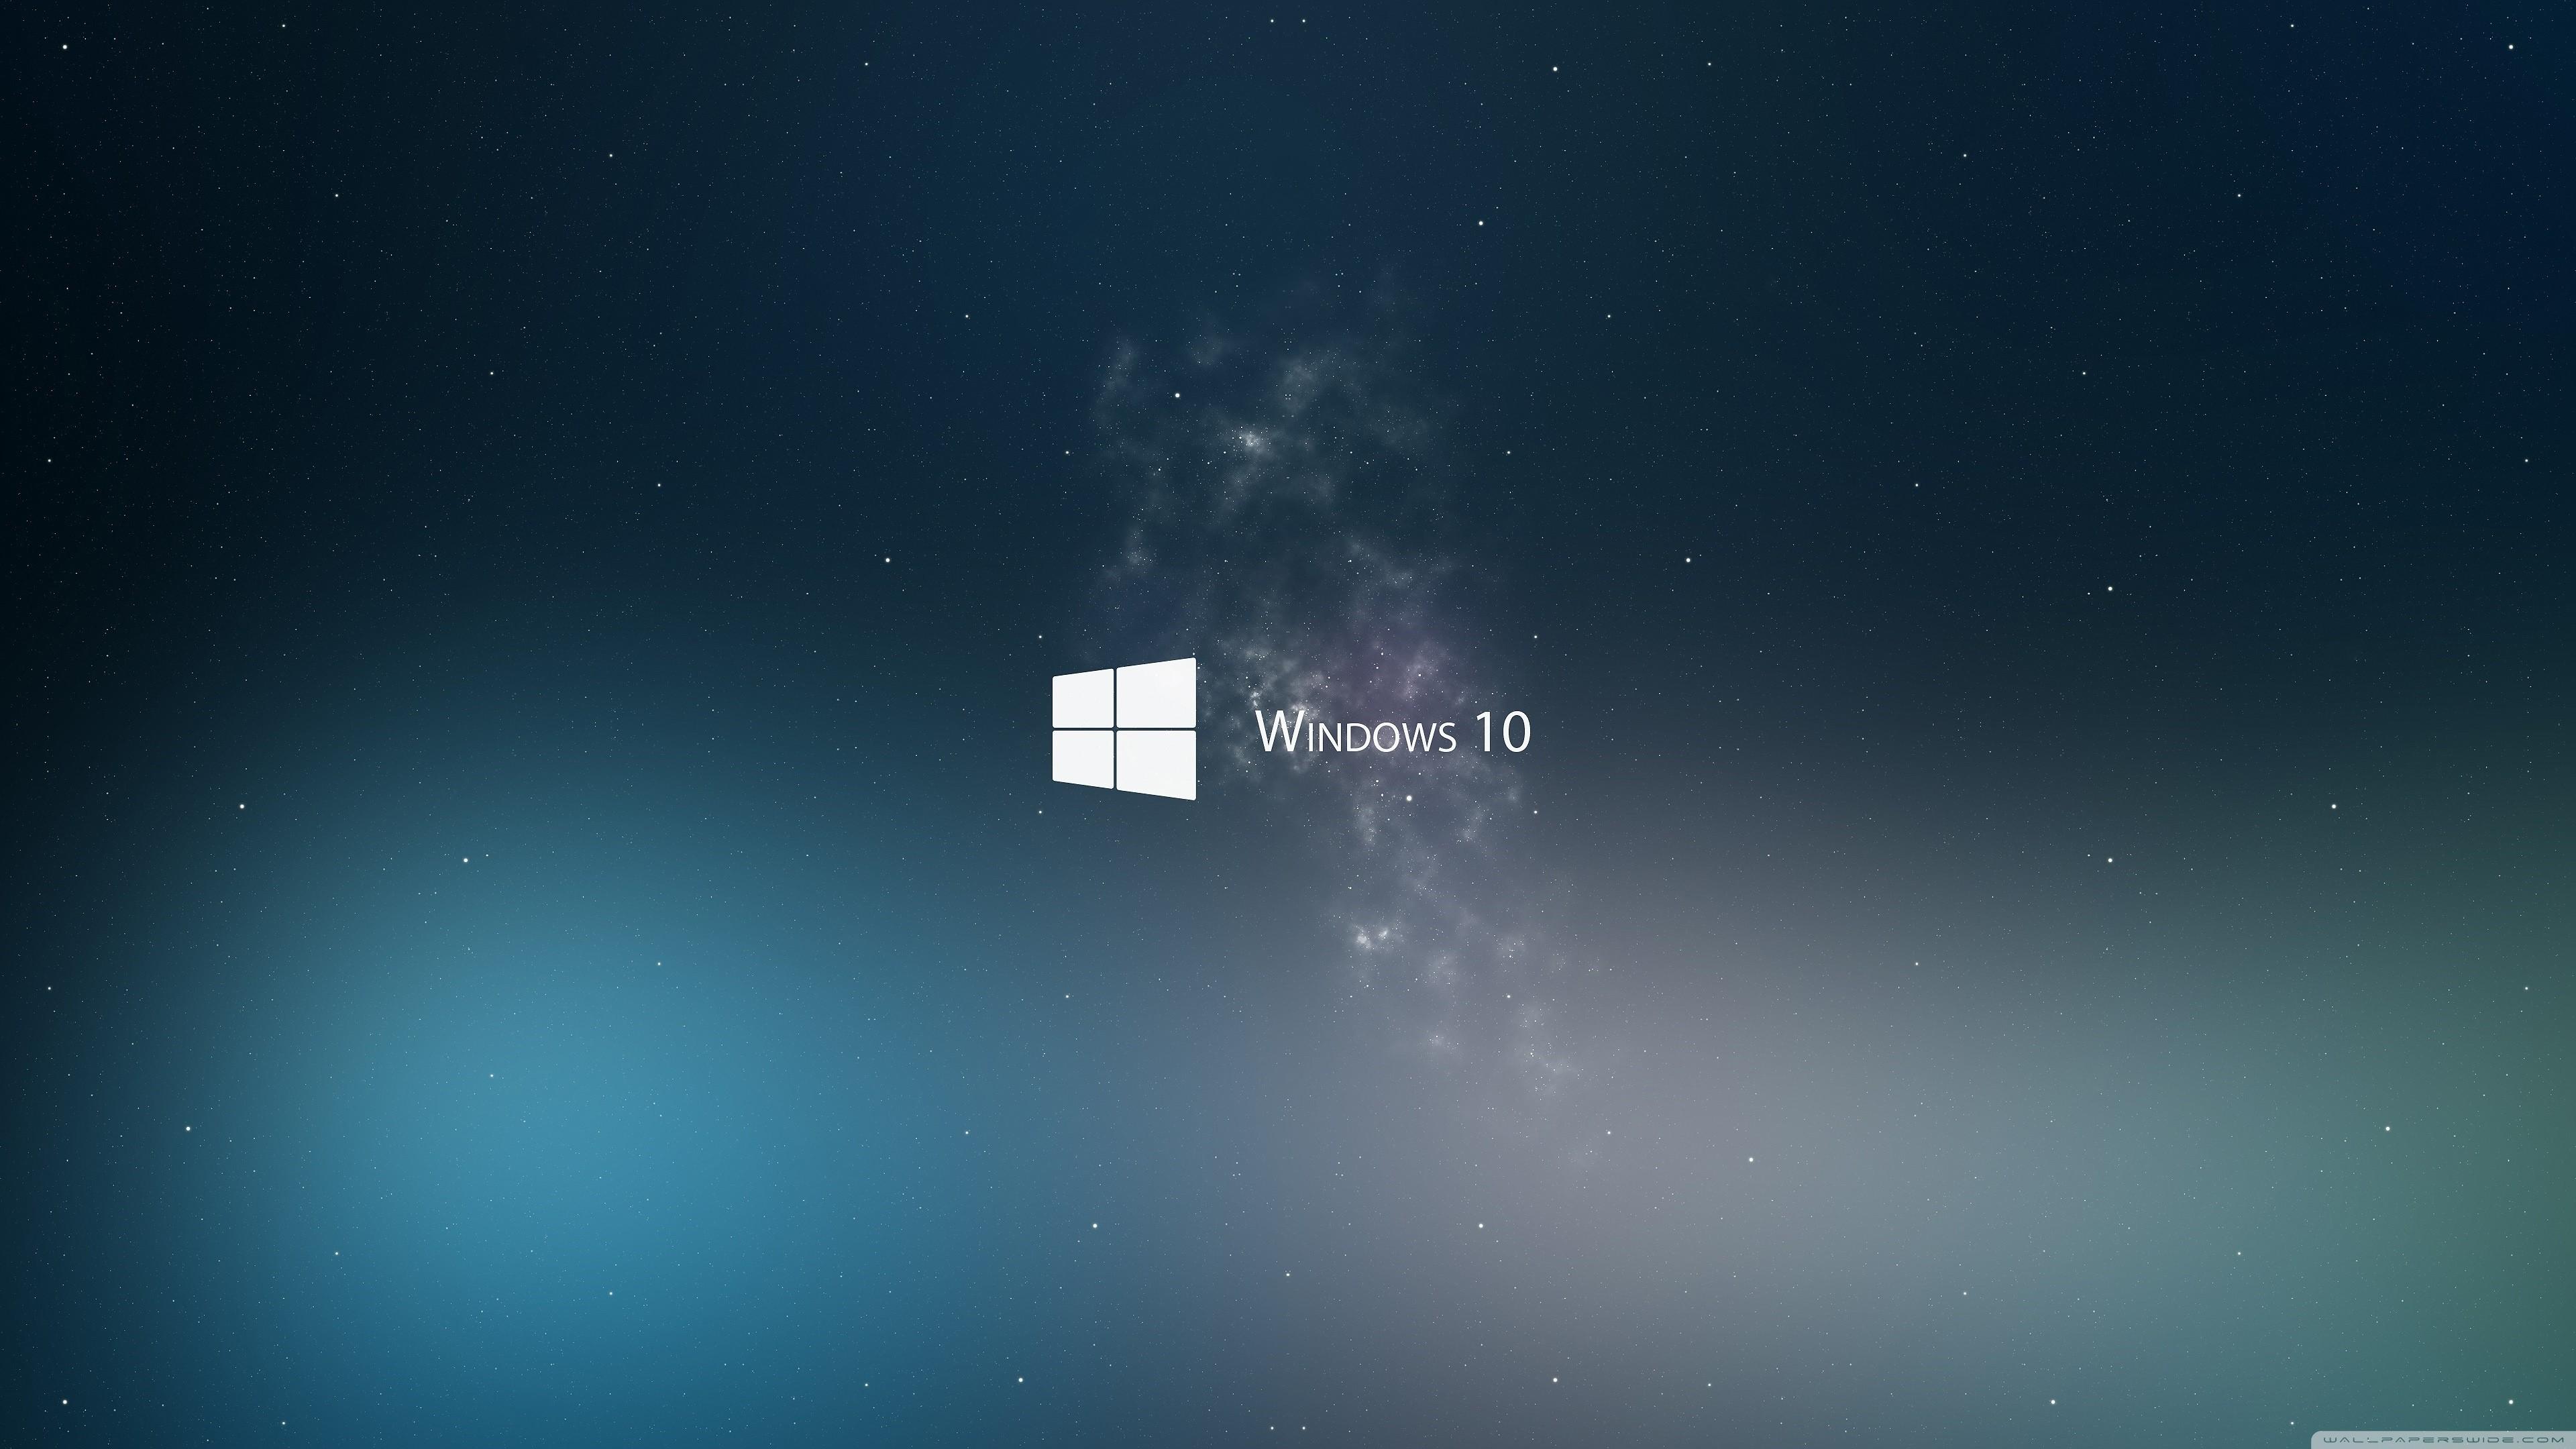 Windows 10 HD Wide Wallpaper for Widescreen